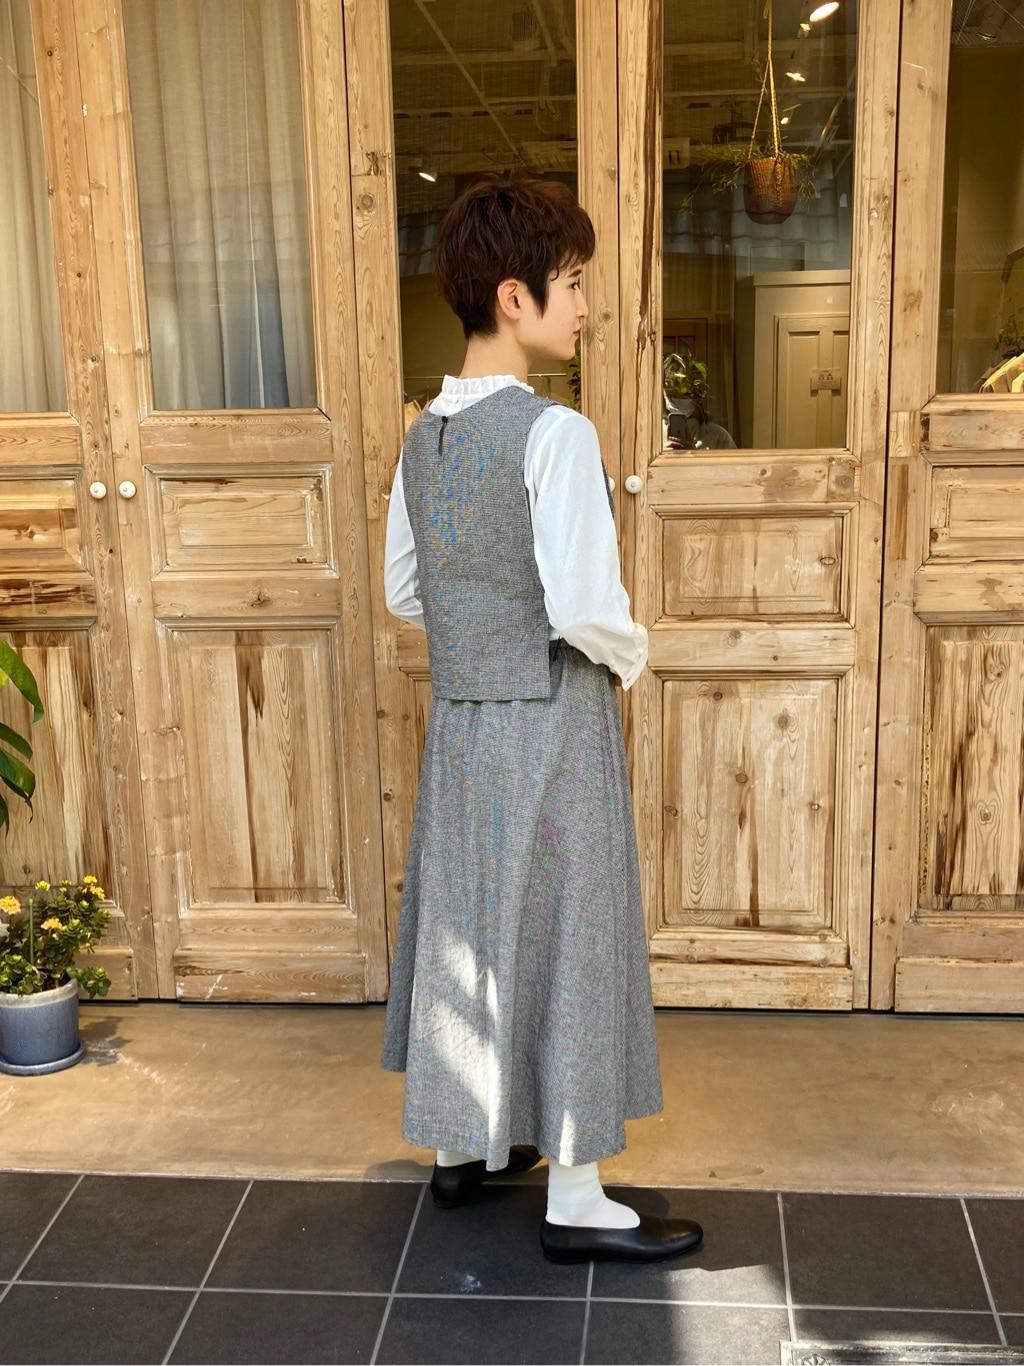 yuni / bulle de savon 京都路面 身長:159cm 2021.02.16